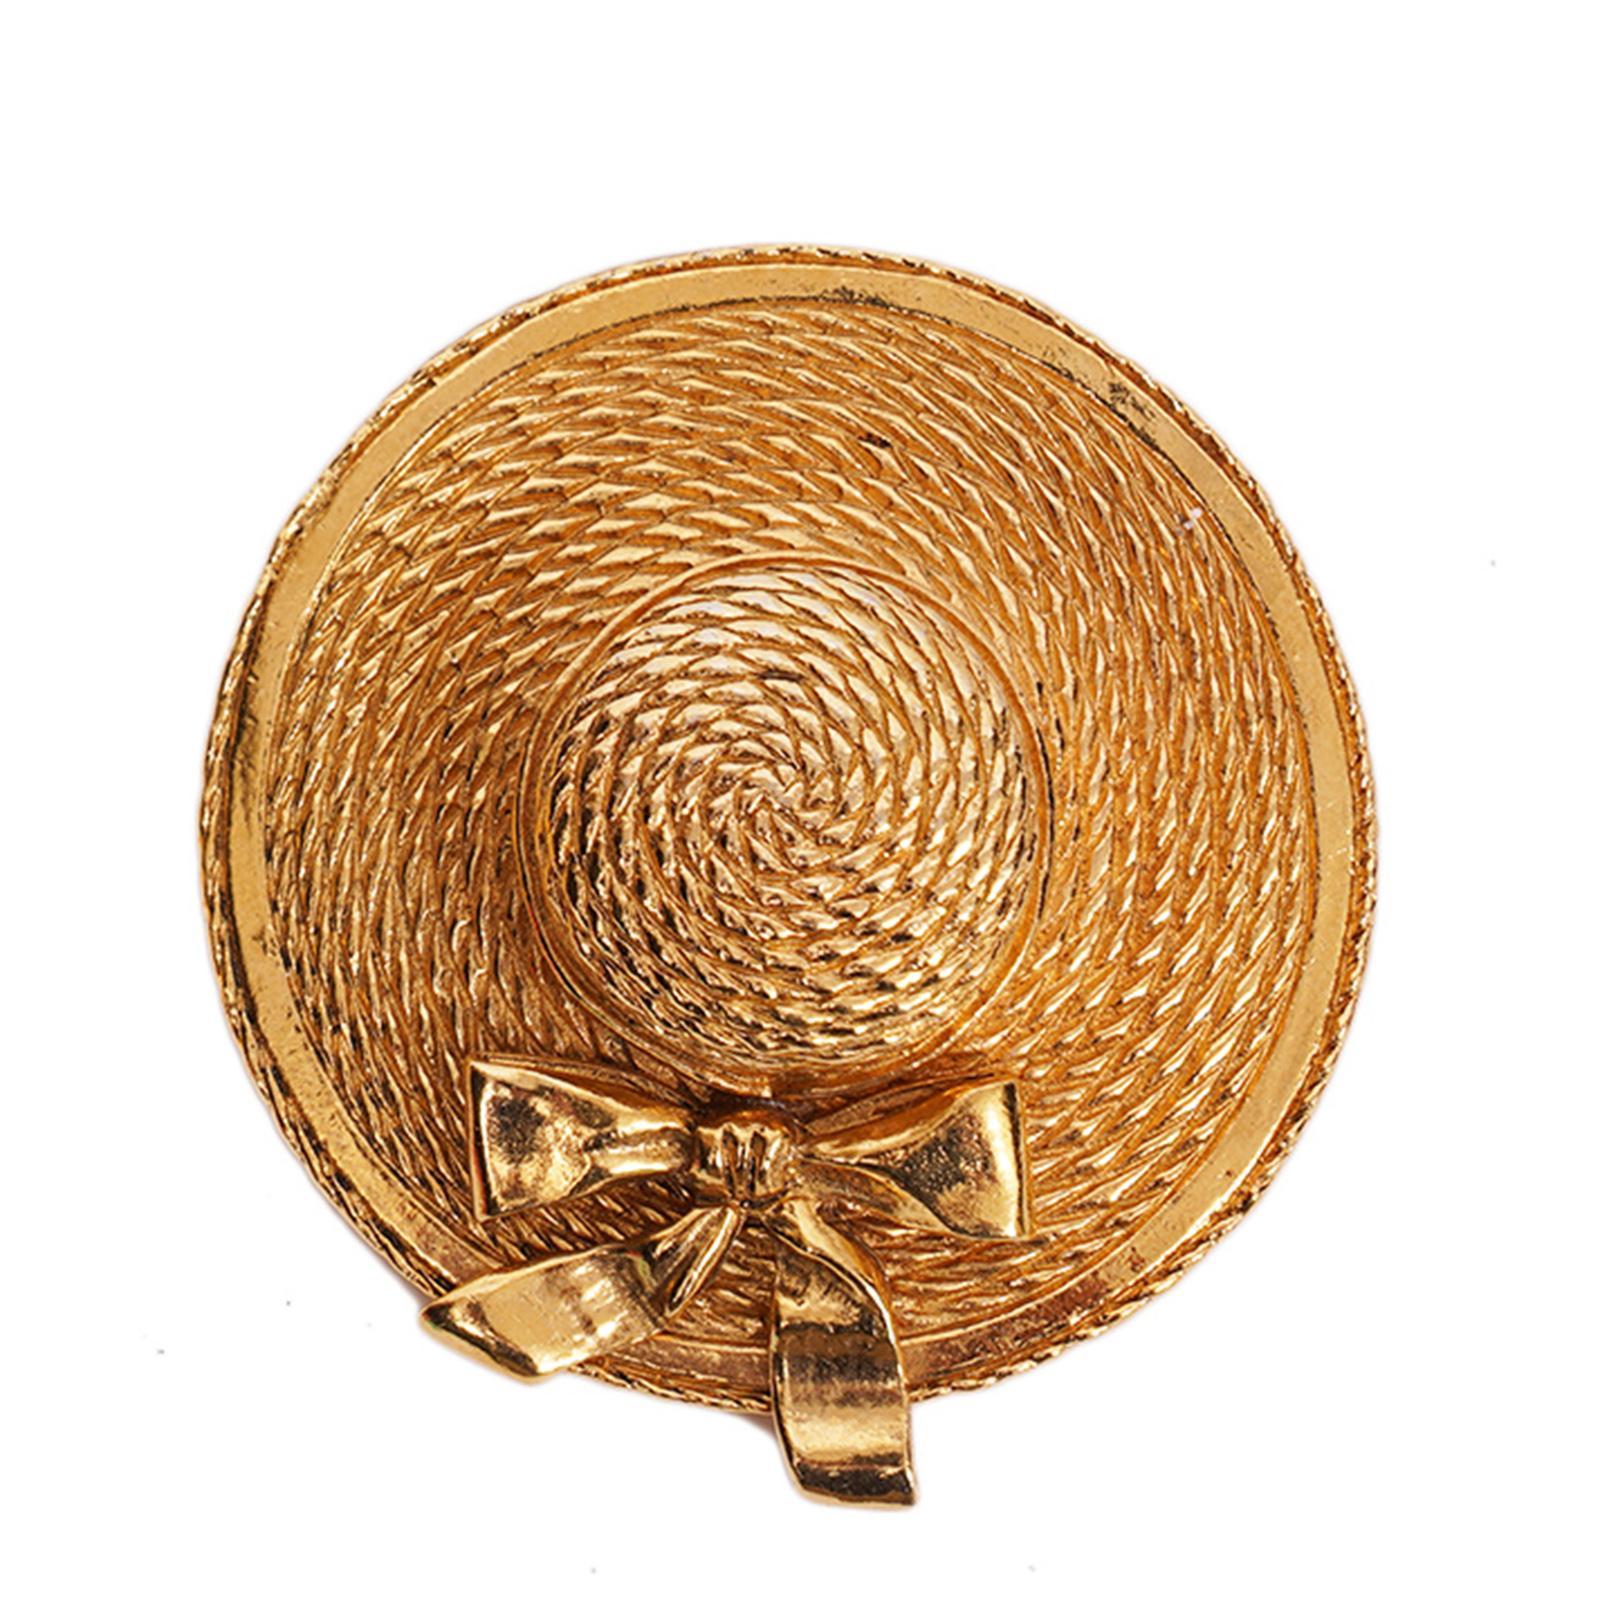 Chanel Vintage Gold Tone Hat Brooch 1970's